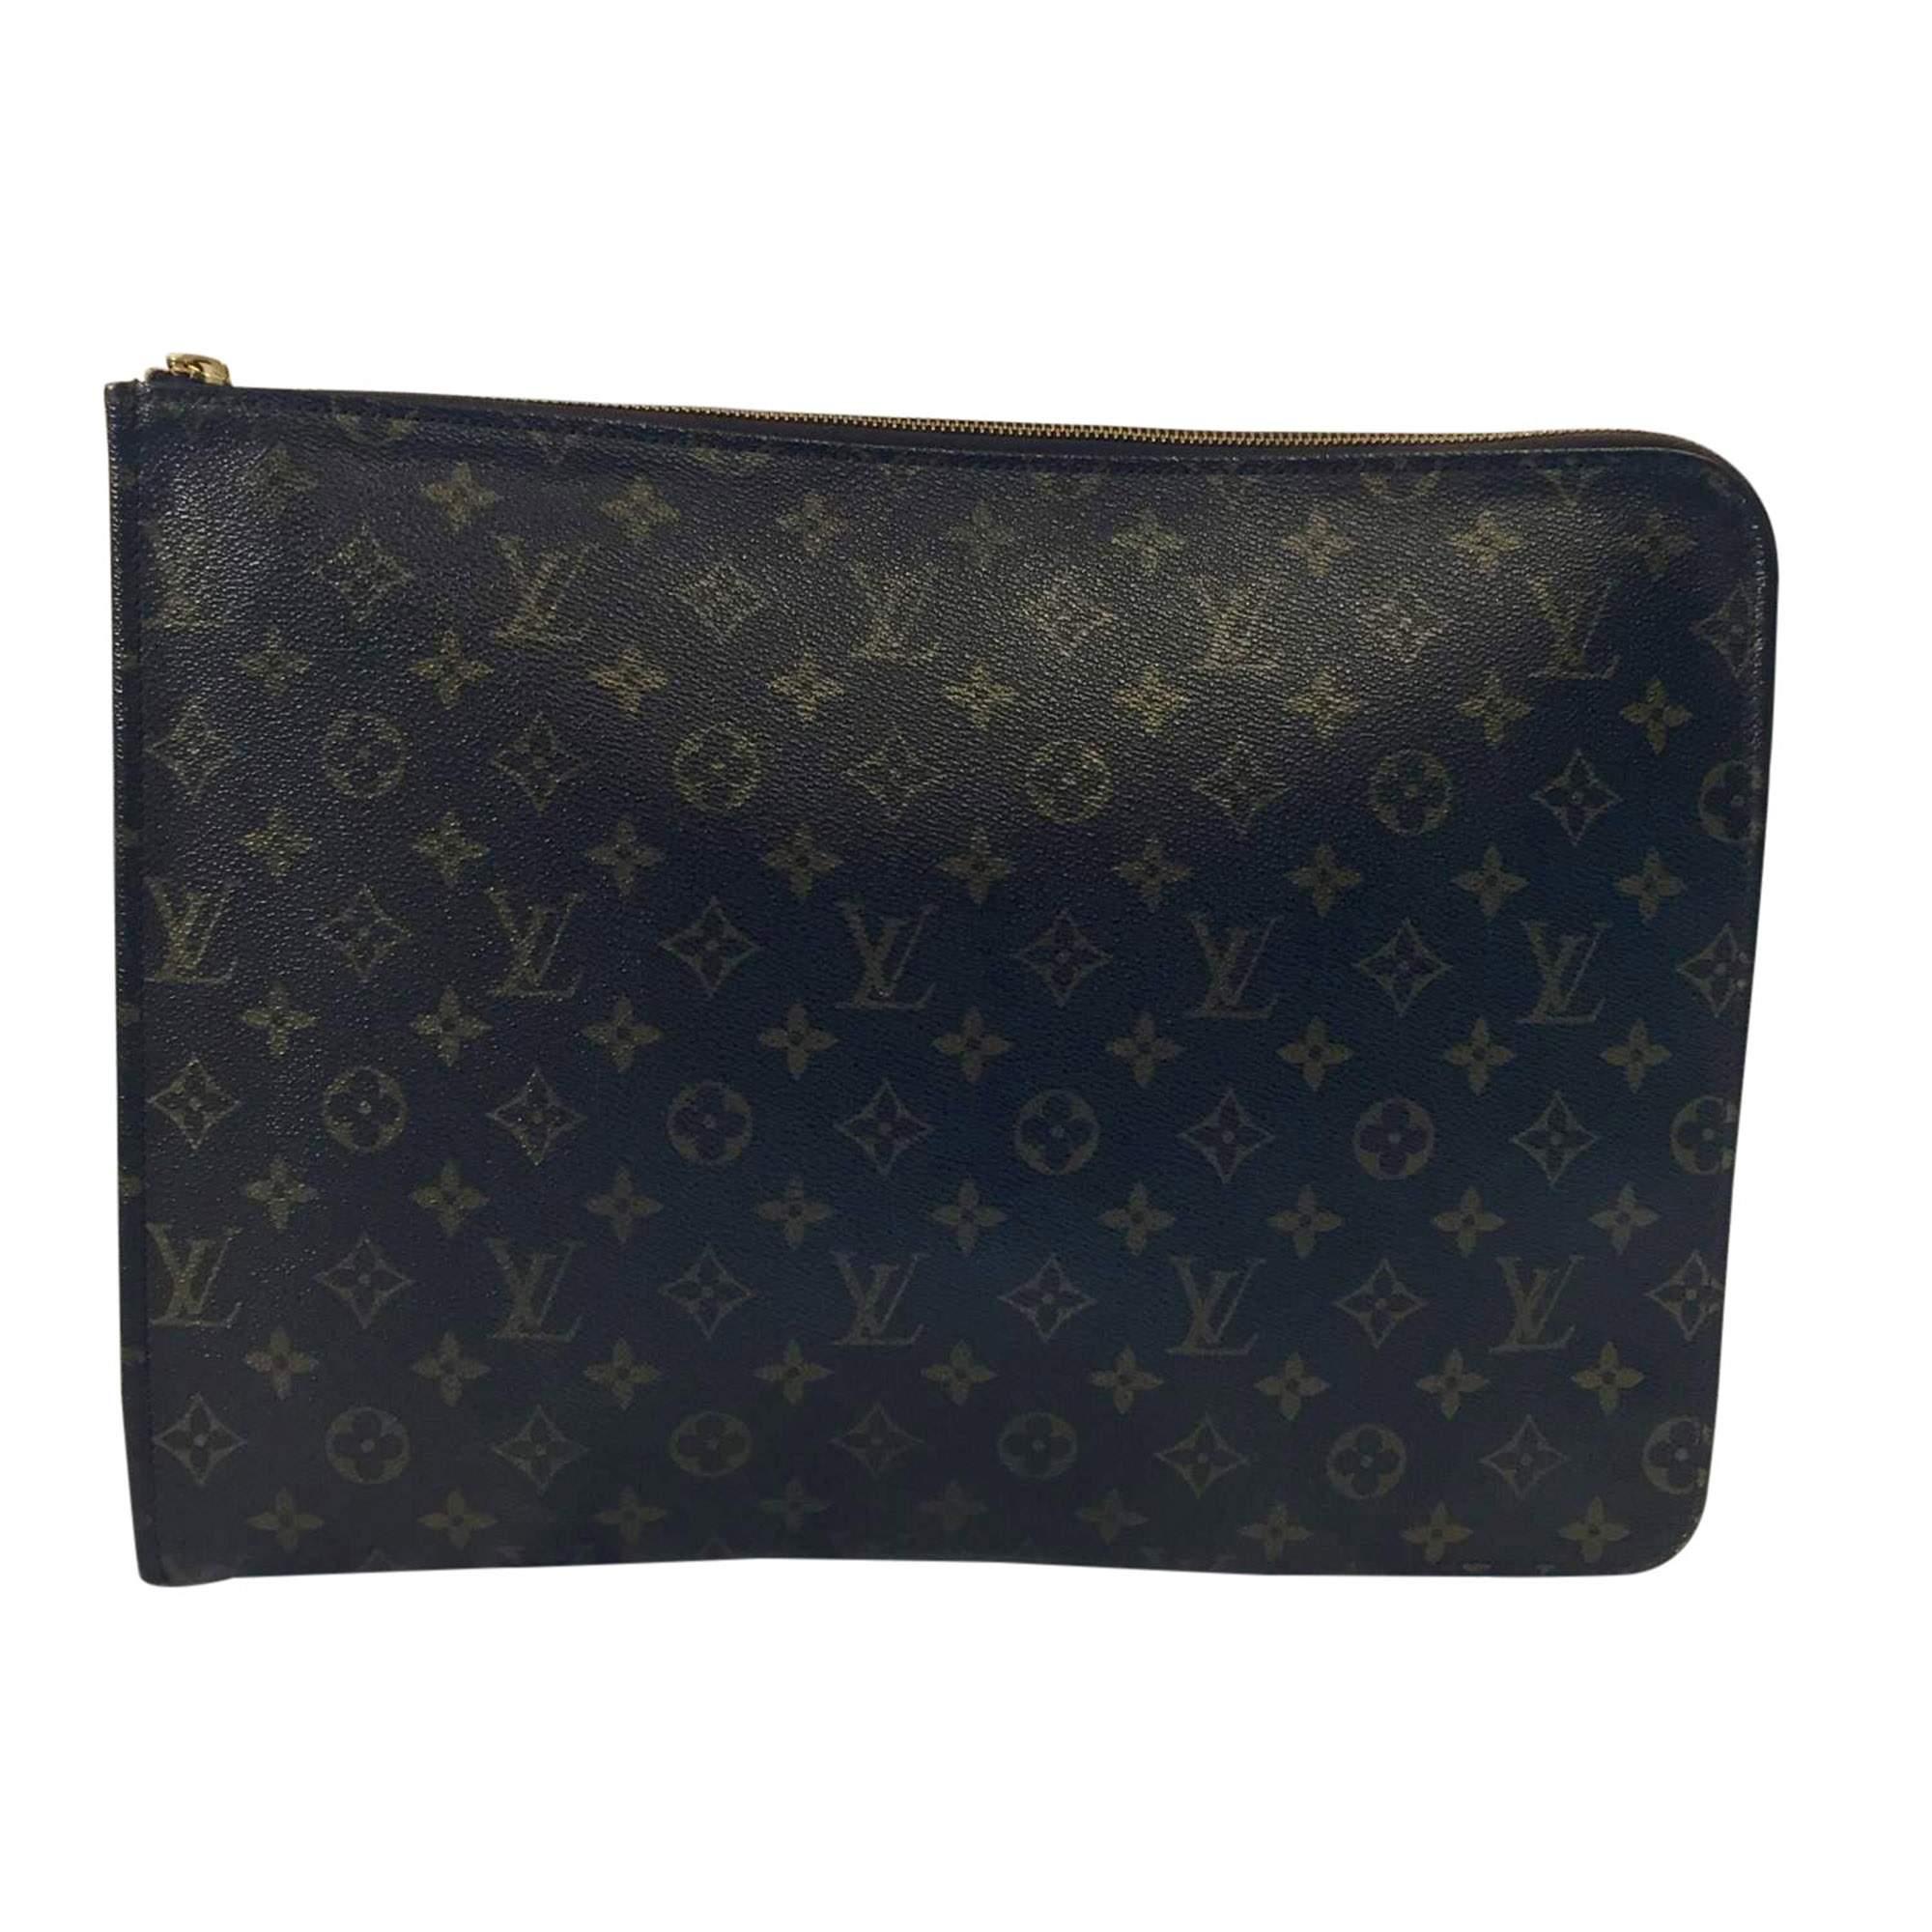 0230e93f878a Louis Vuitton Monogram canvas Clutch